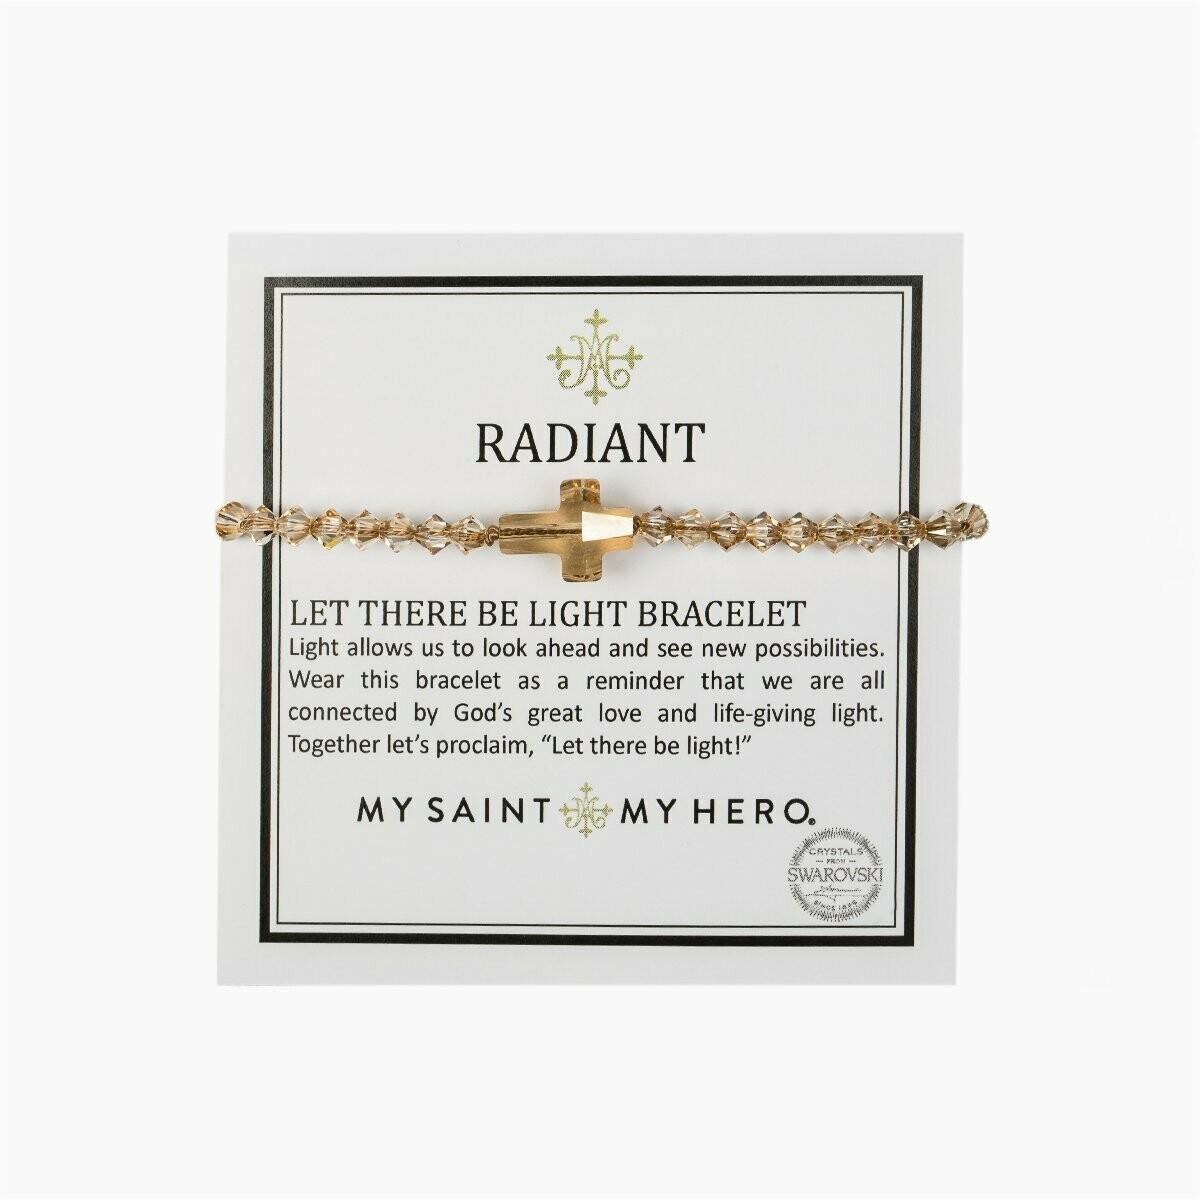 Radiant Let There Be Light Bracelet (Golden Shadow)